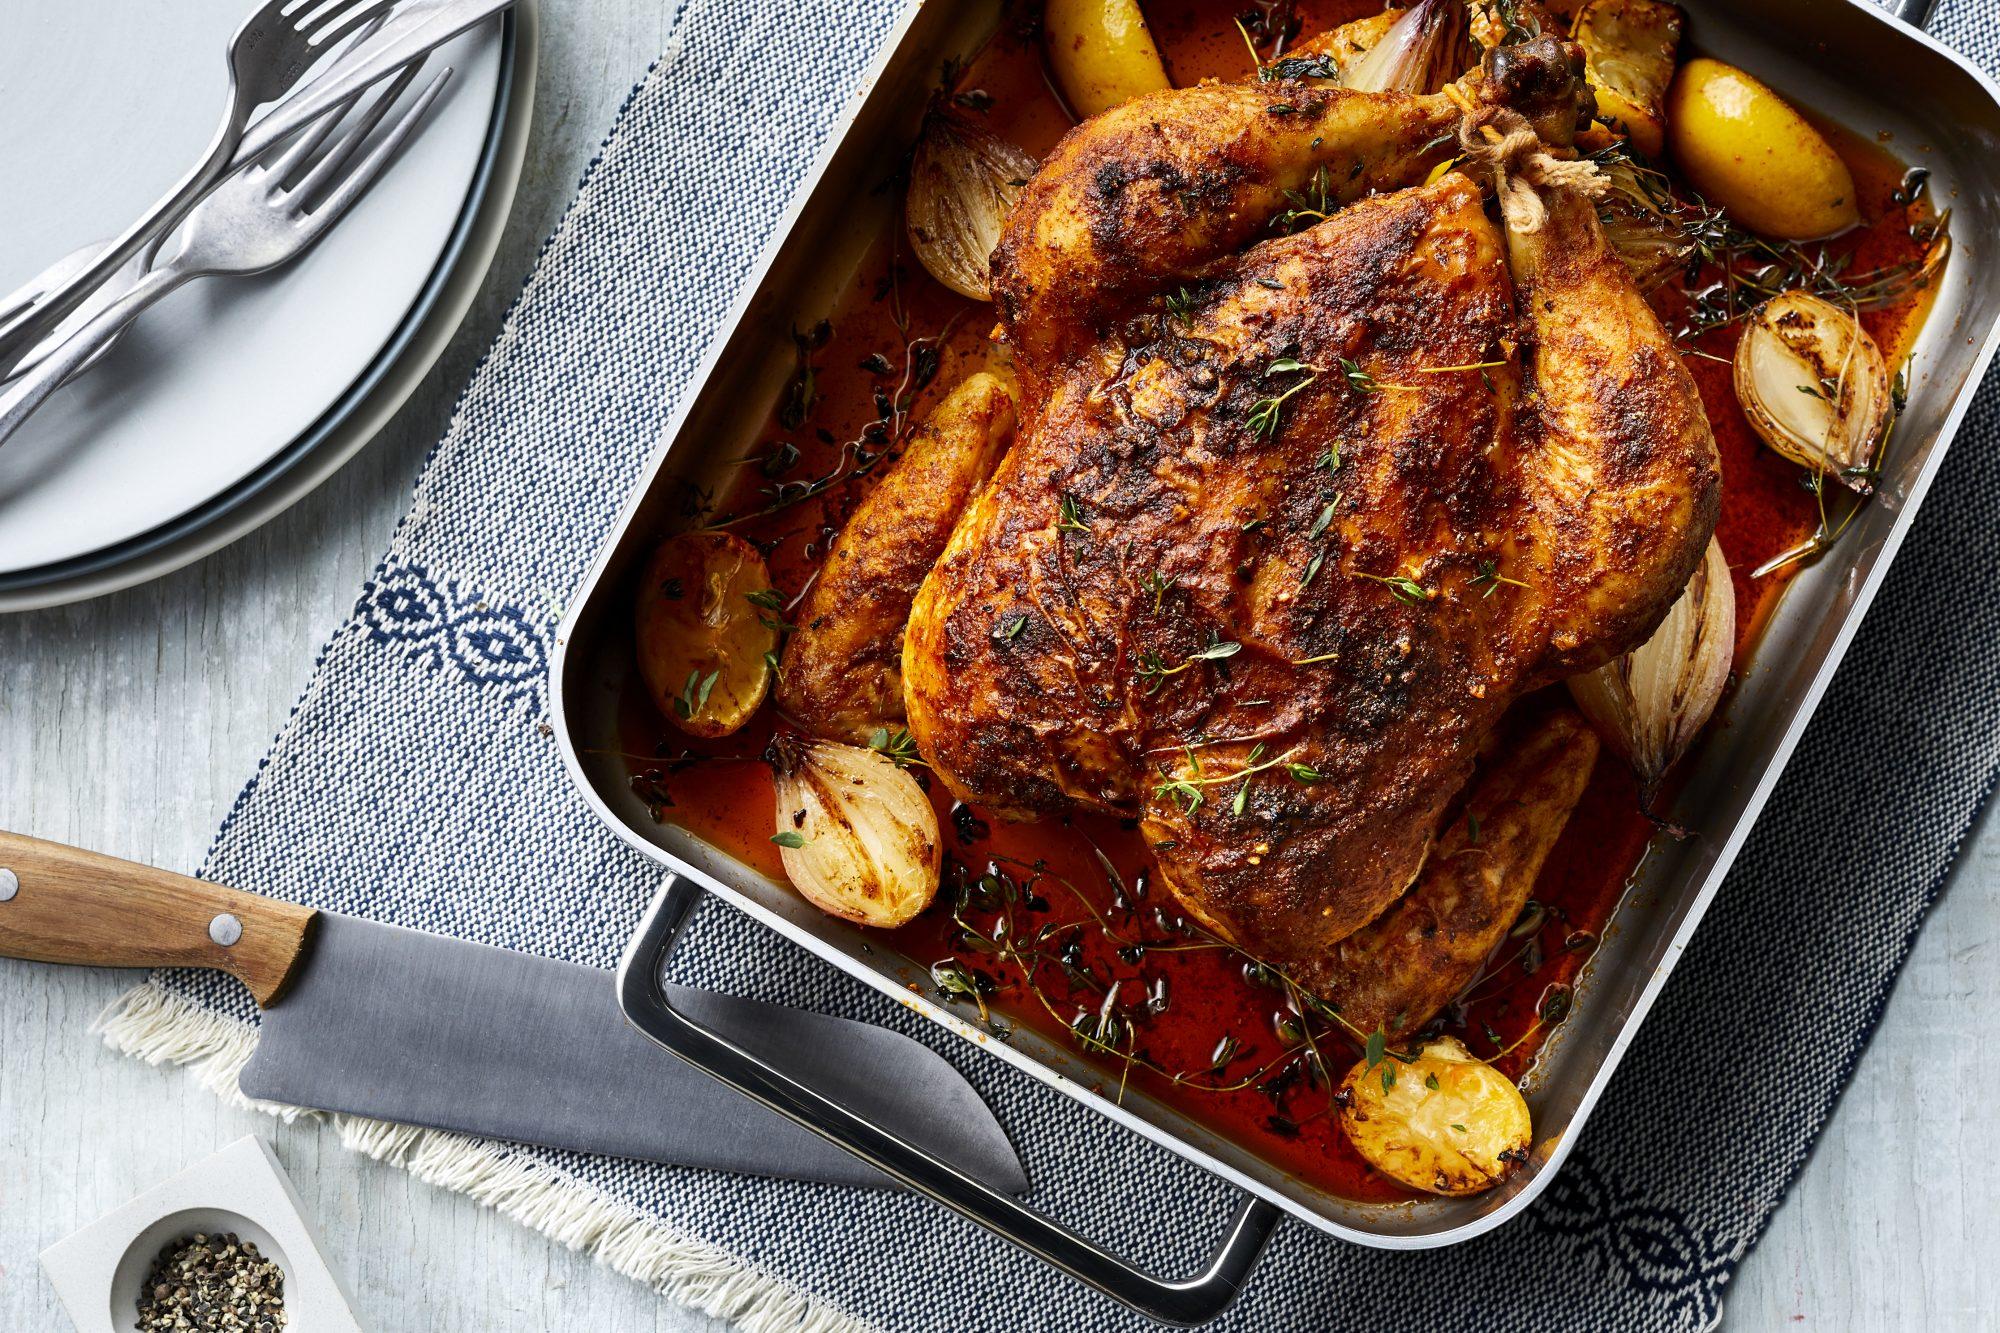 mr-classic-roast-chicken